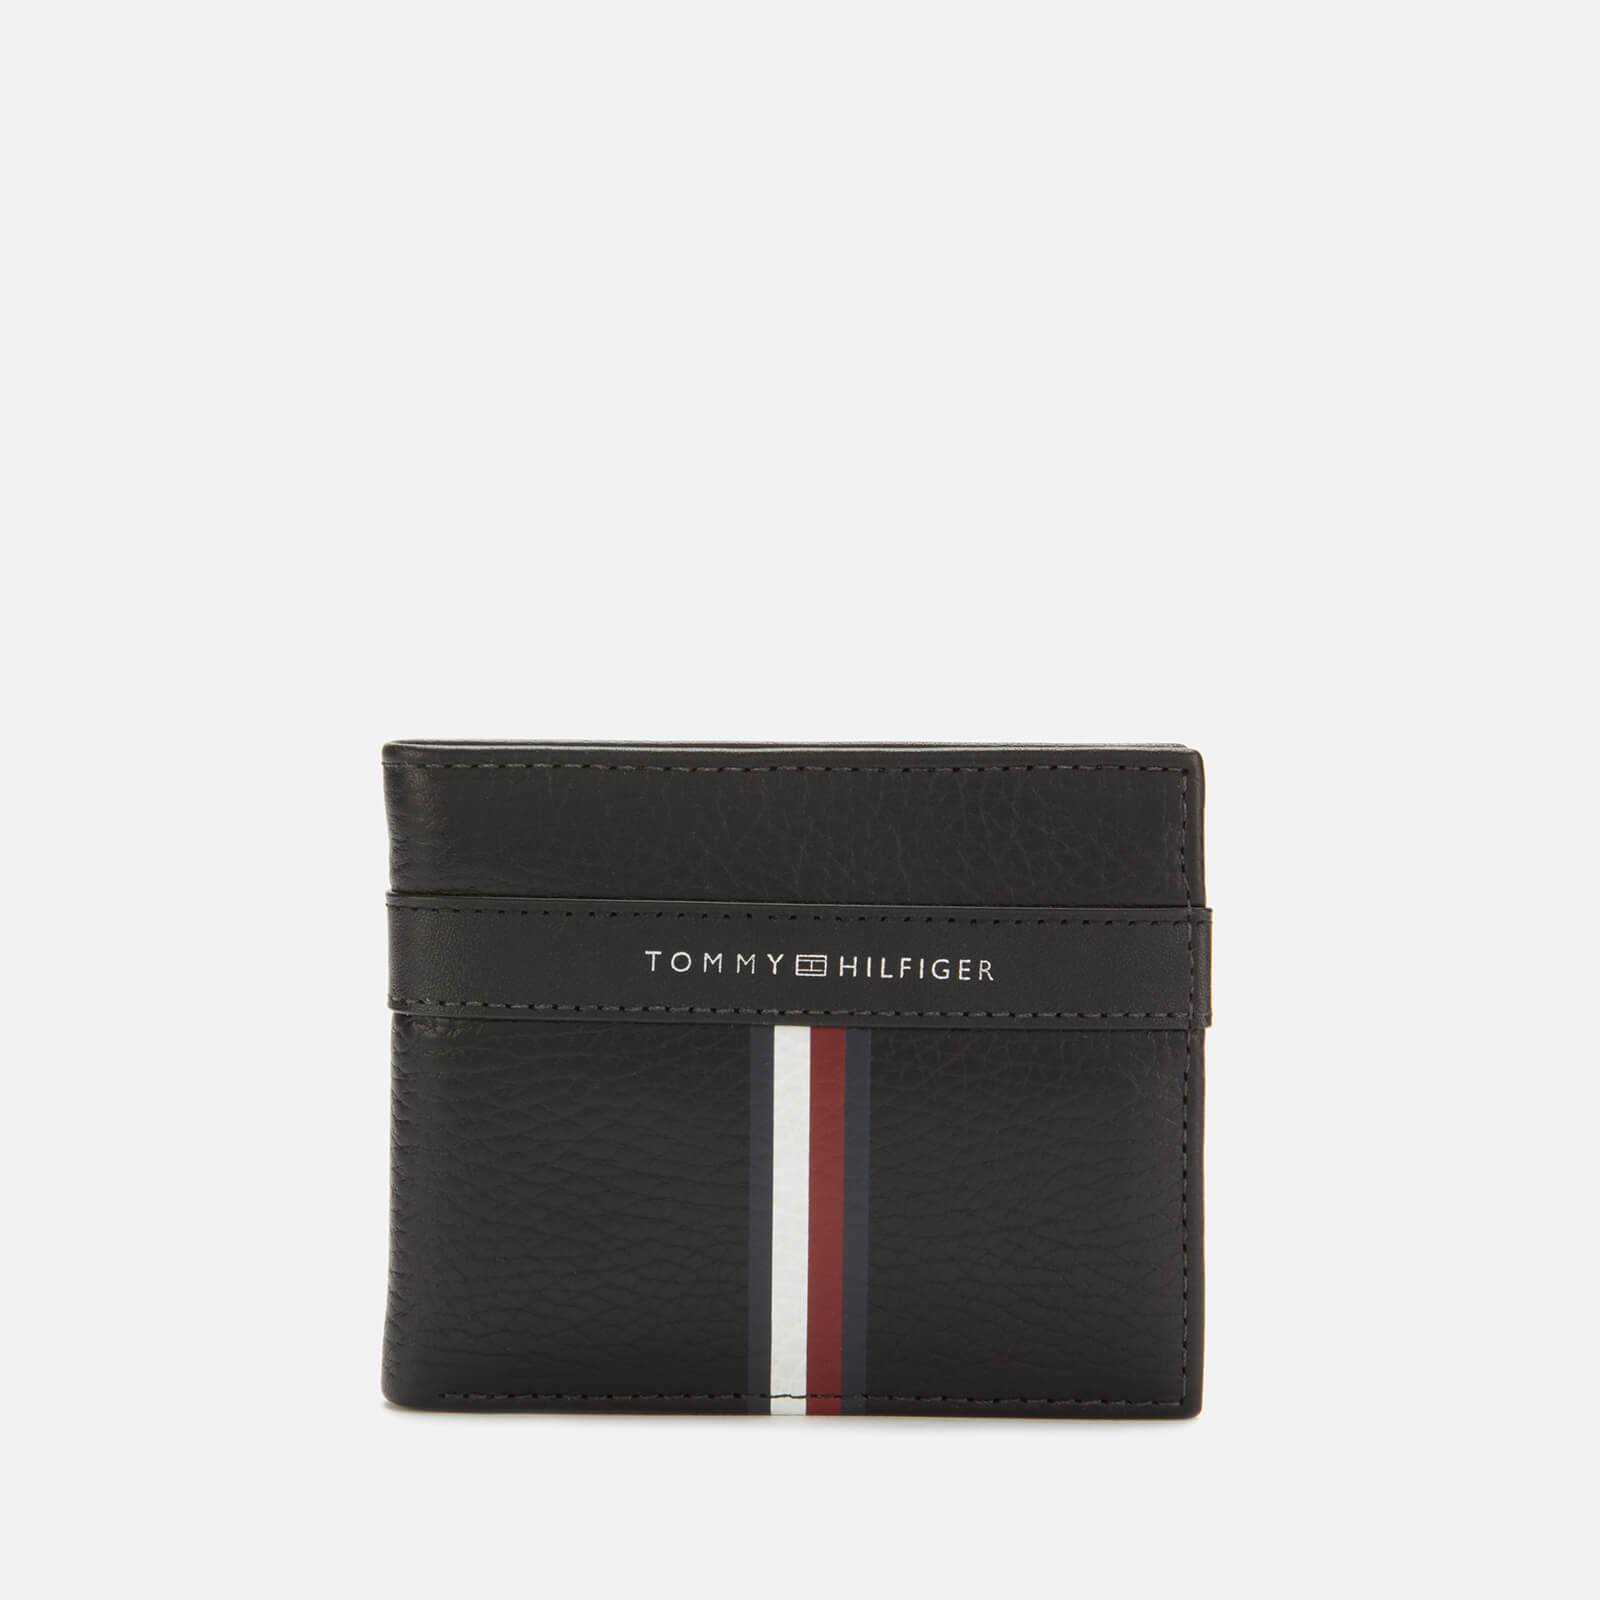 Tommy Hilfiger Men's Corporate Leather Mini Credit Card Wallet - Black